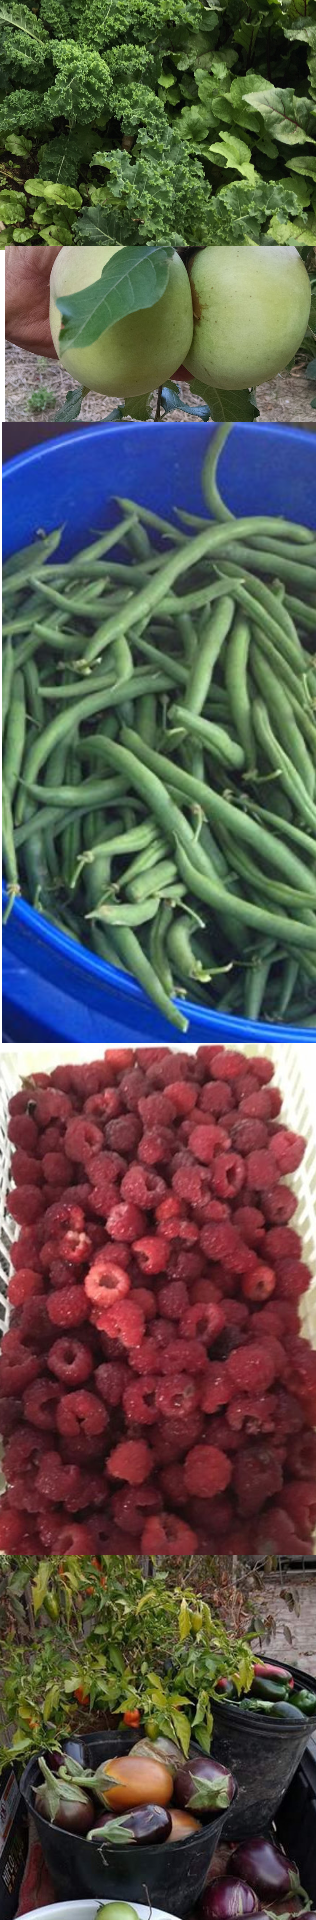 Mountain Brook Farm produce